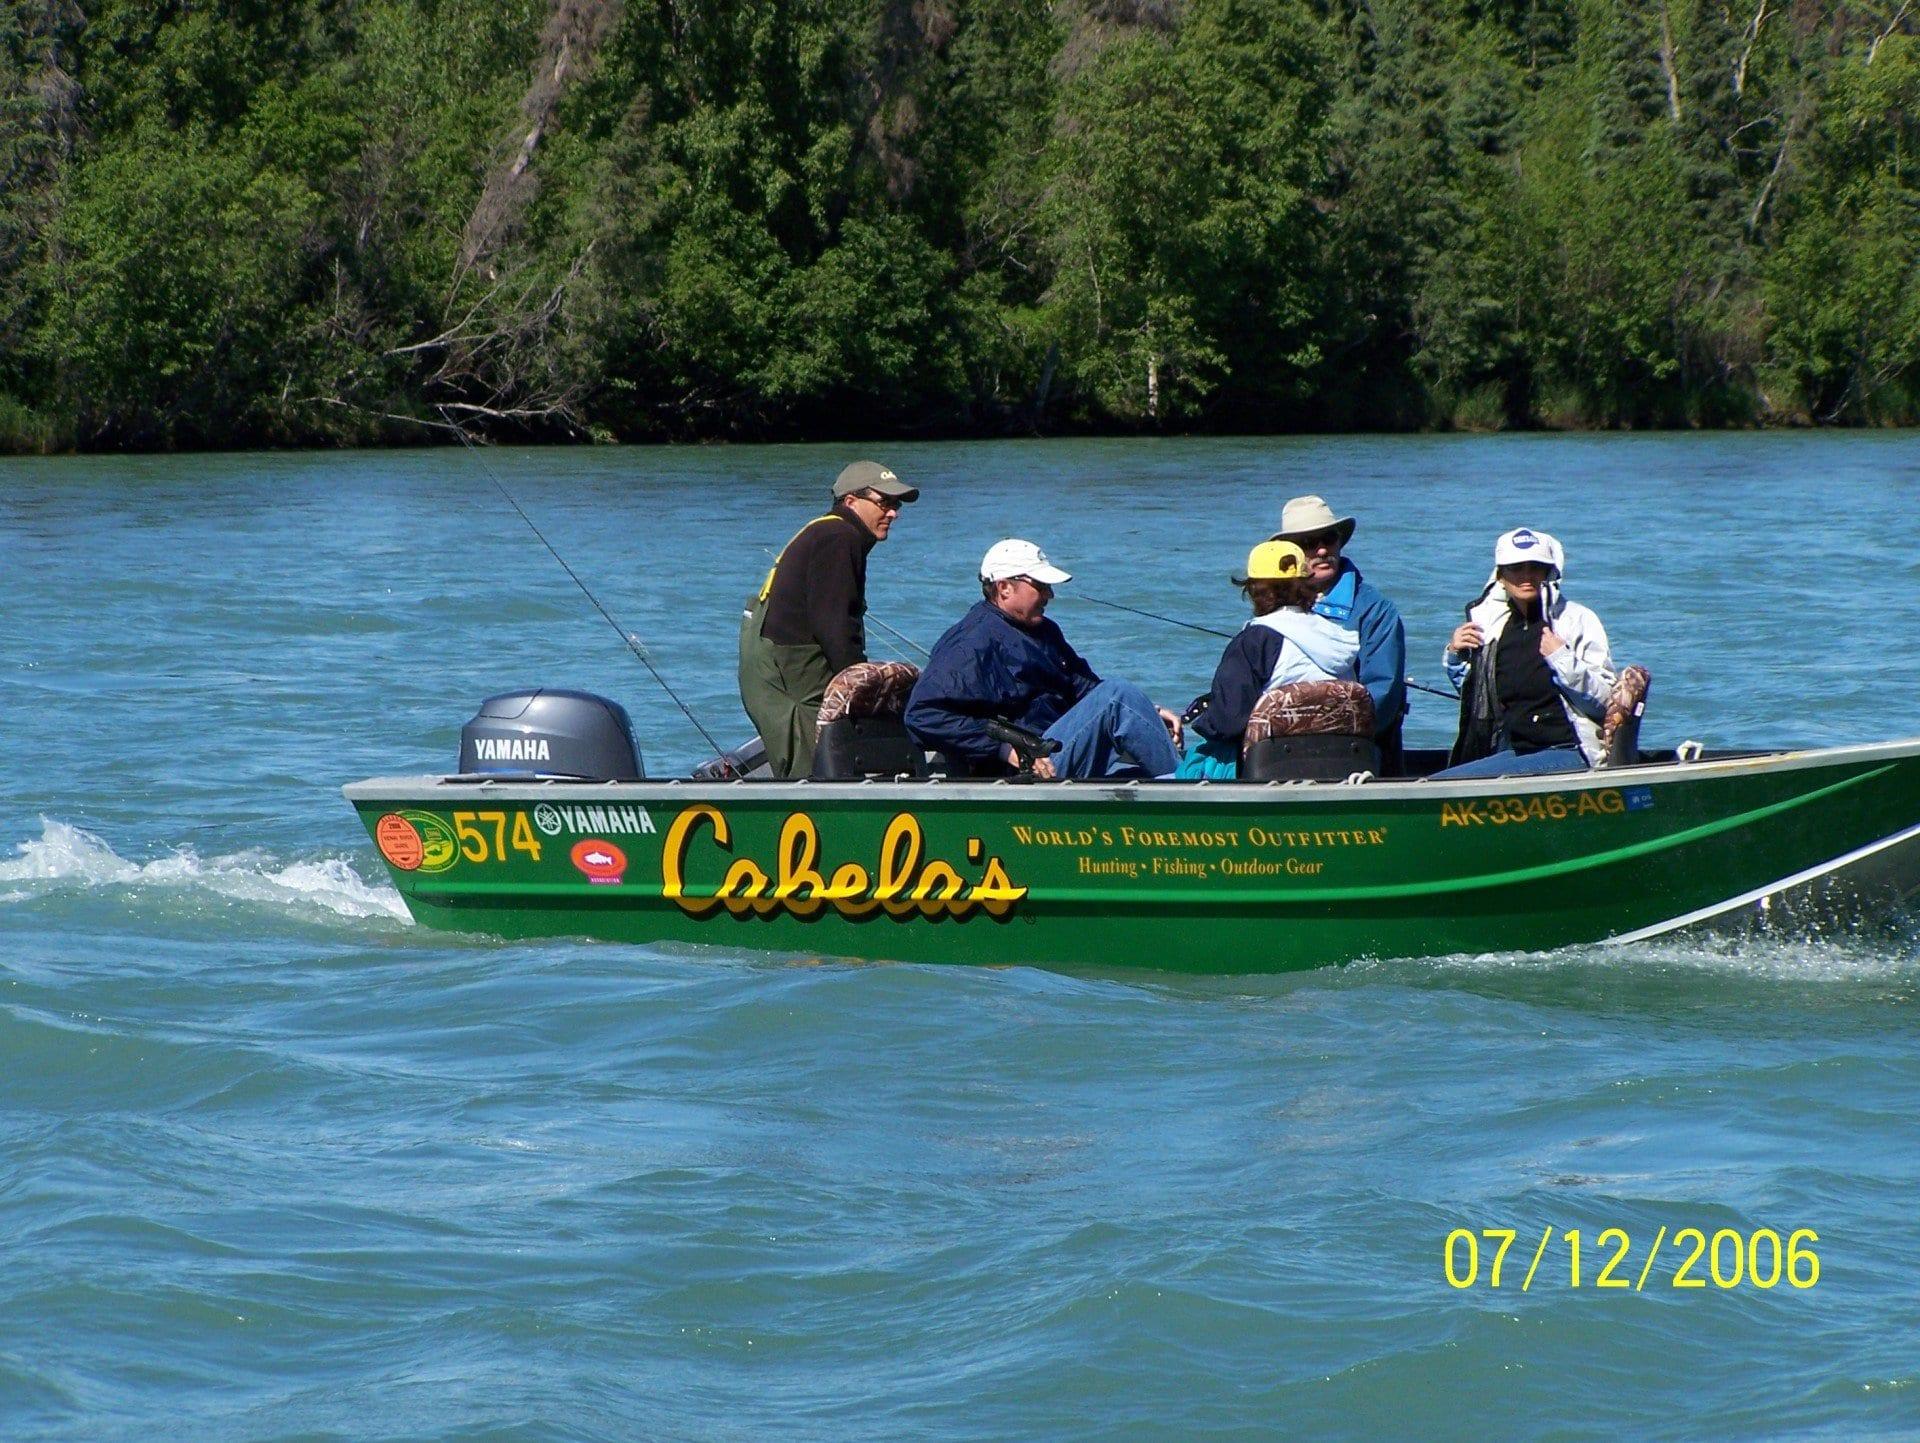 fisherman on motorboat